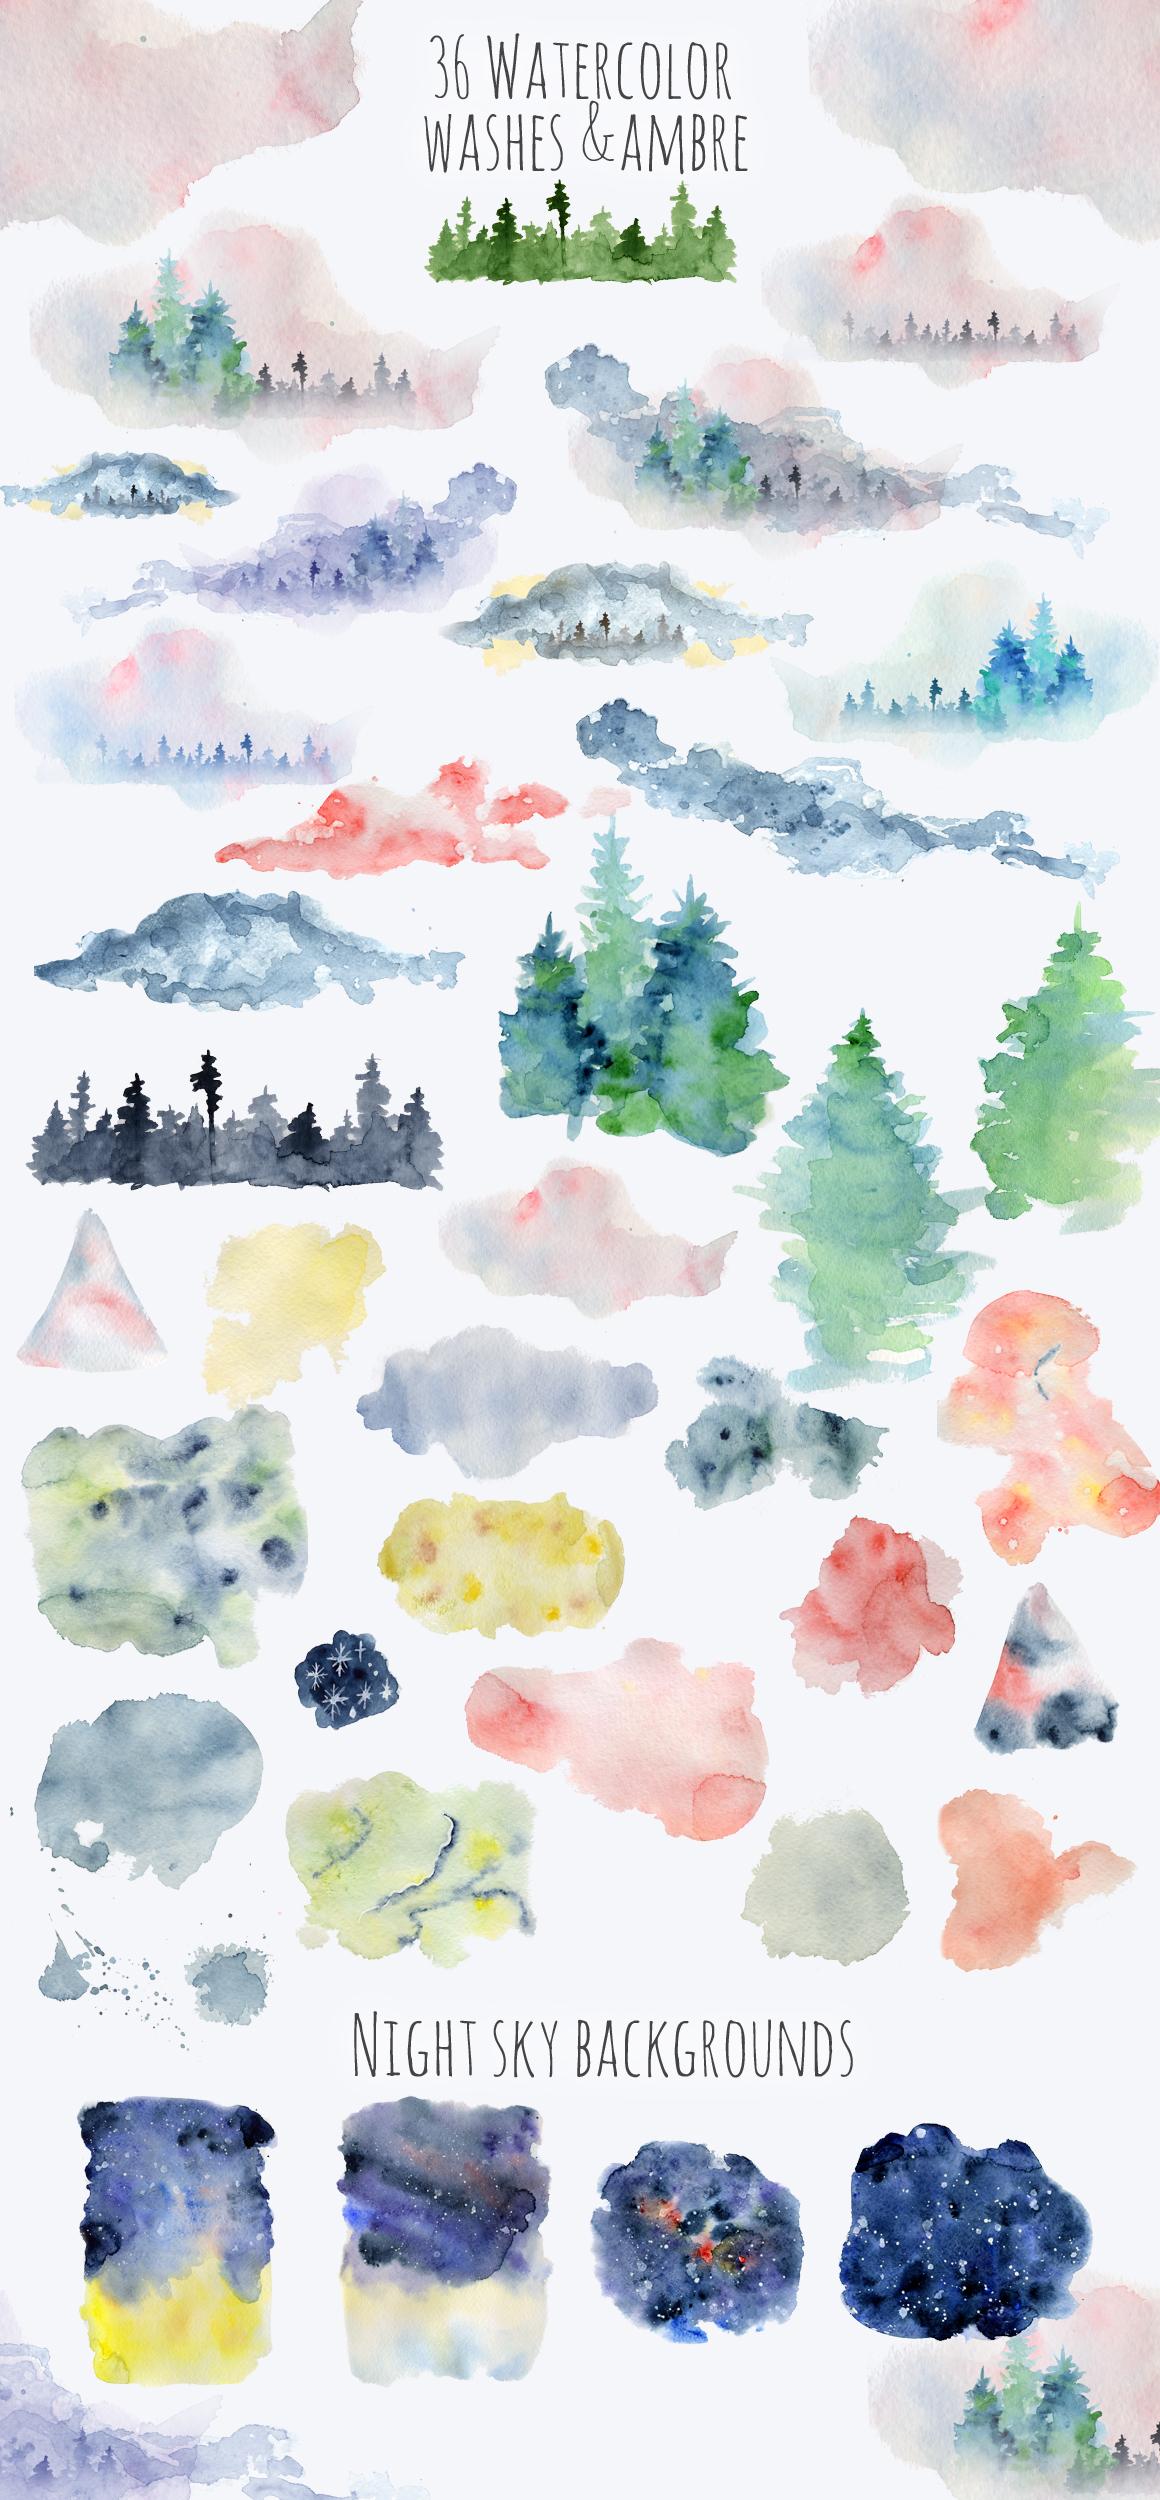 Winter Wonderland Clipart: 14 Christmas Watercolor Clipart Bundles in 1 - $28 - 16 Ambre